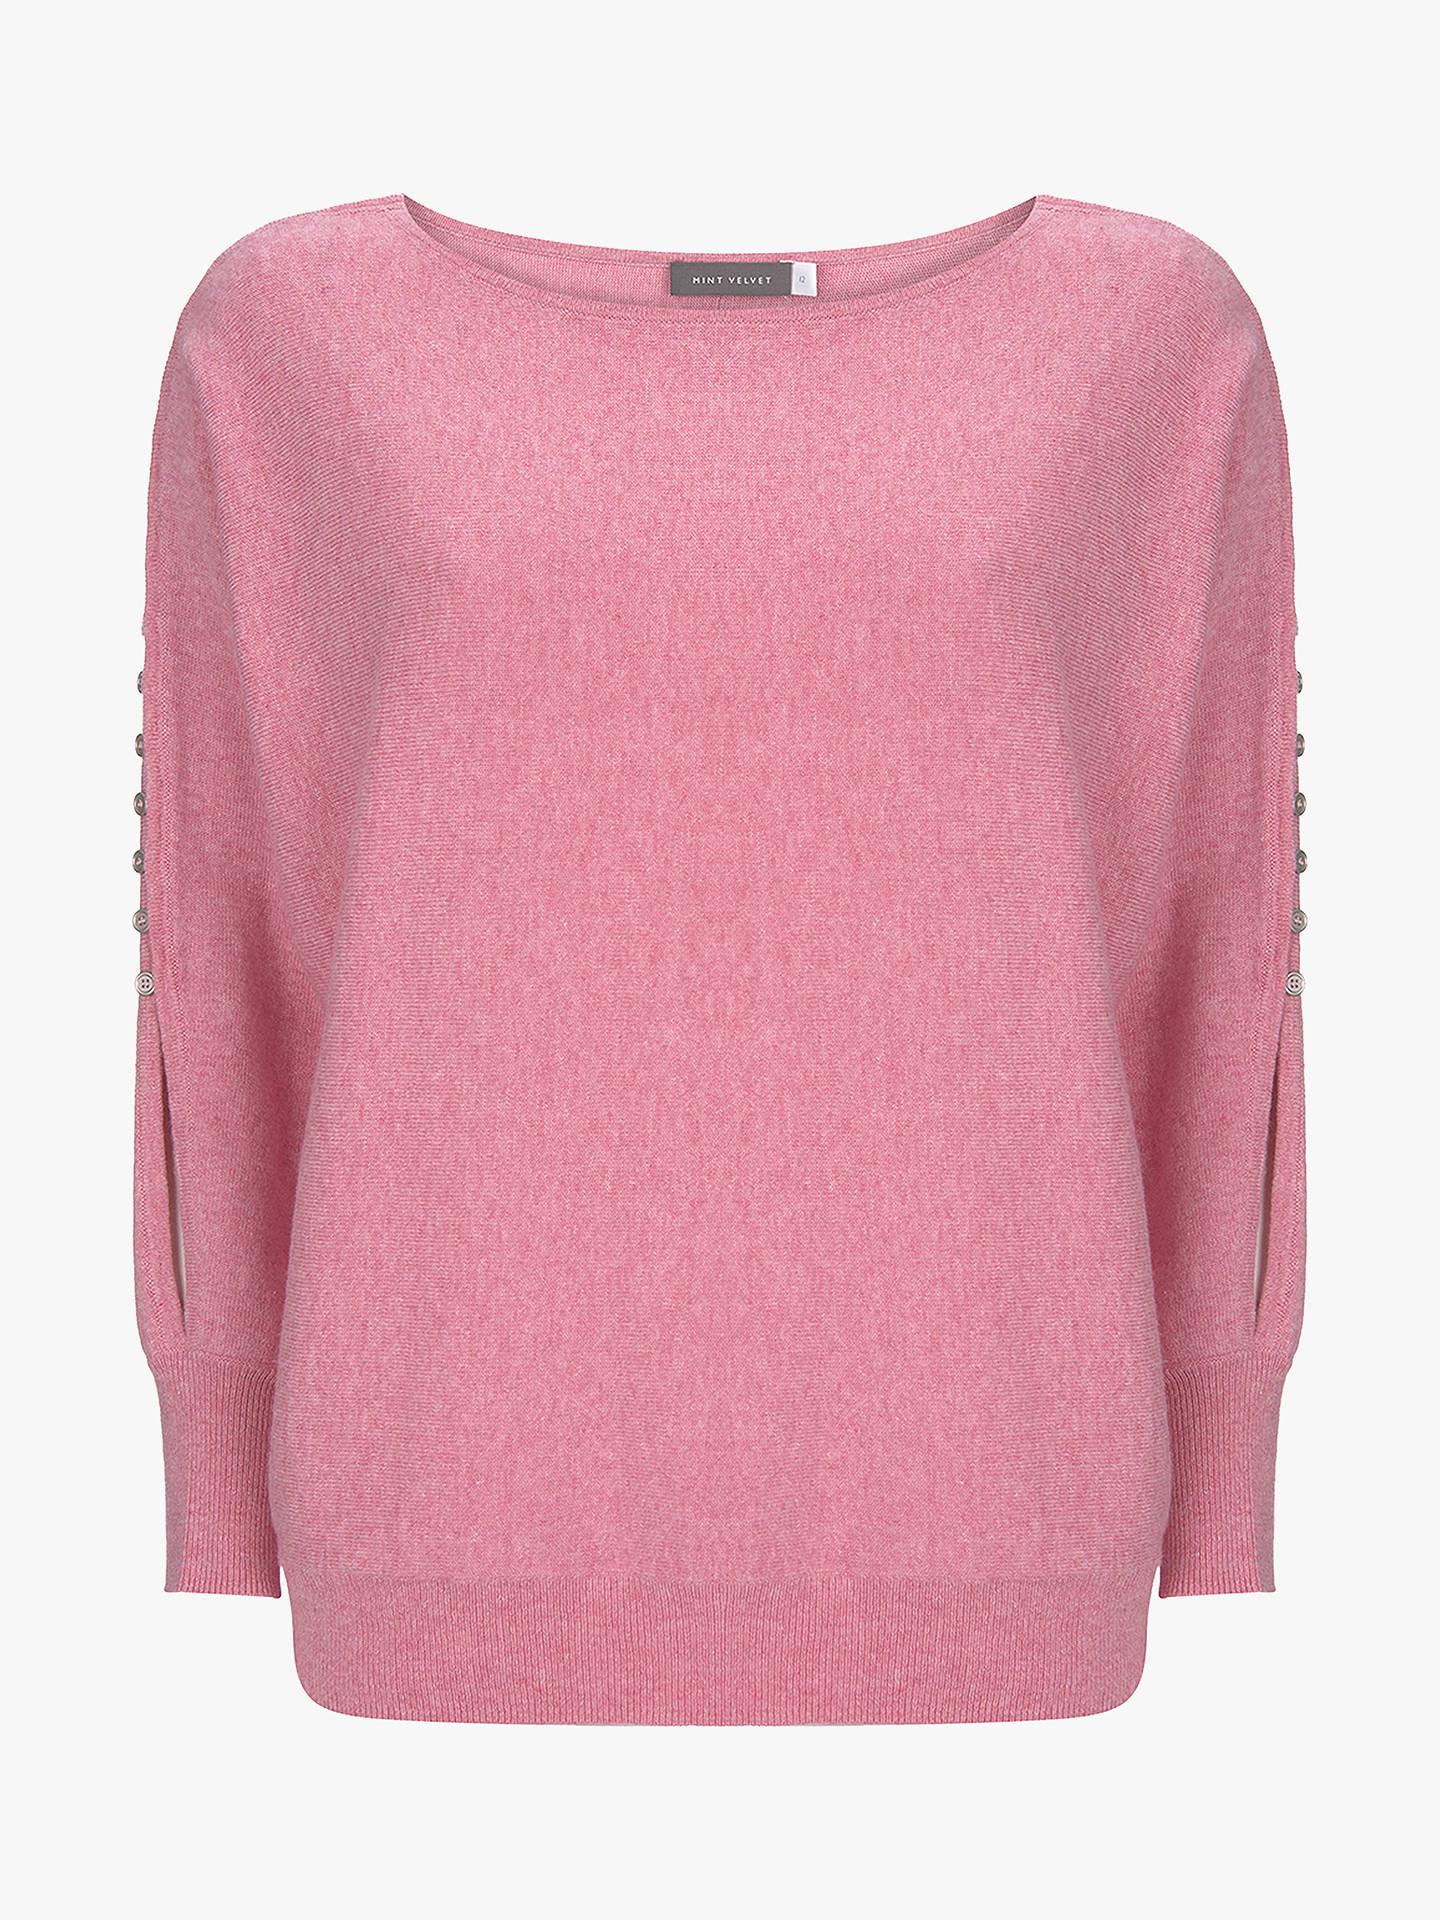 for whole family sale online innovative design Mint Velvet Rouleaux Jumper, Bubblegum Pink at John Lewis ...